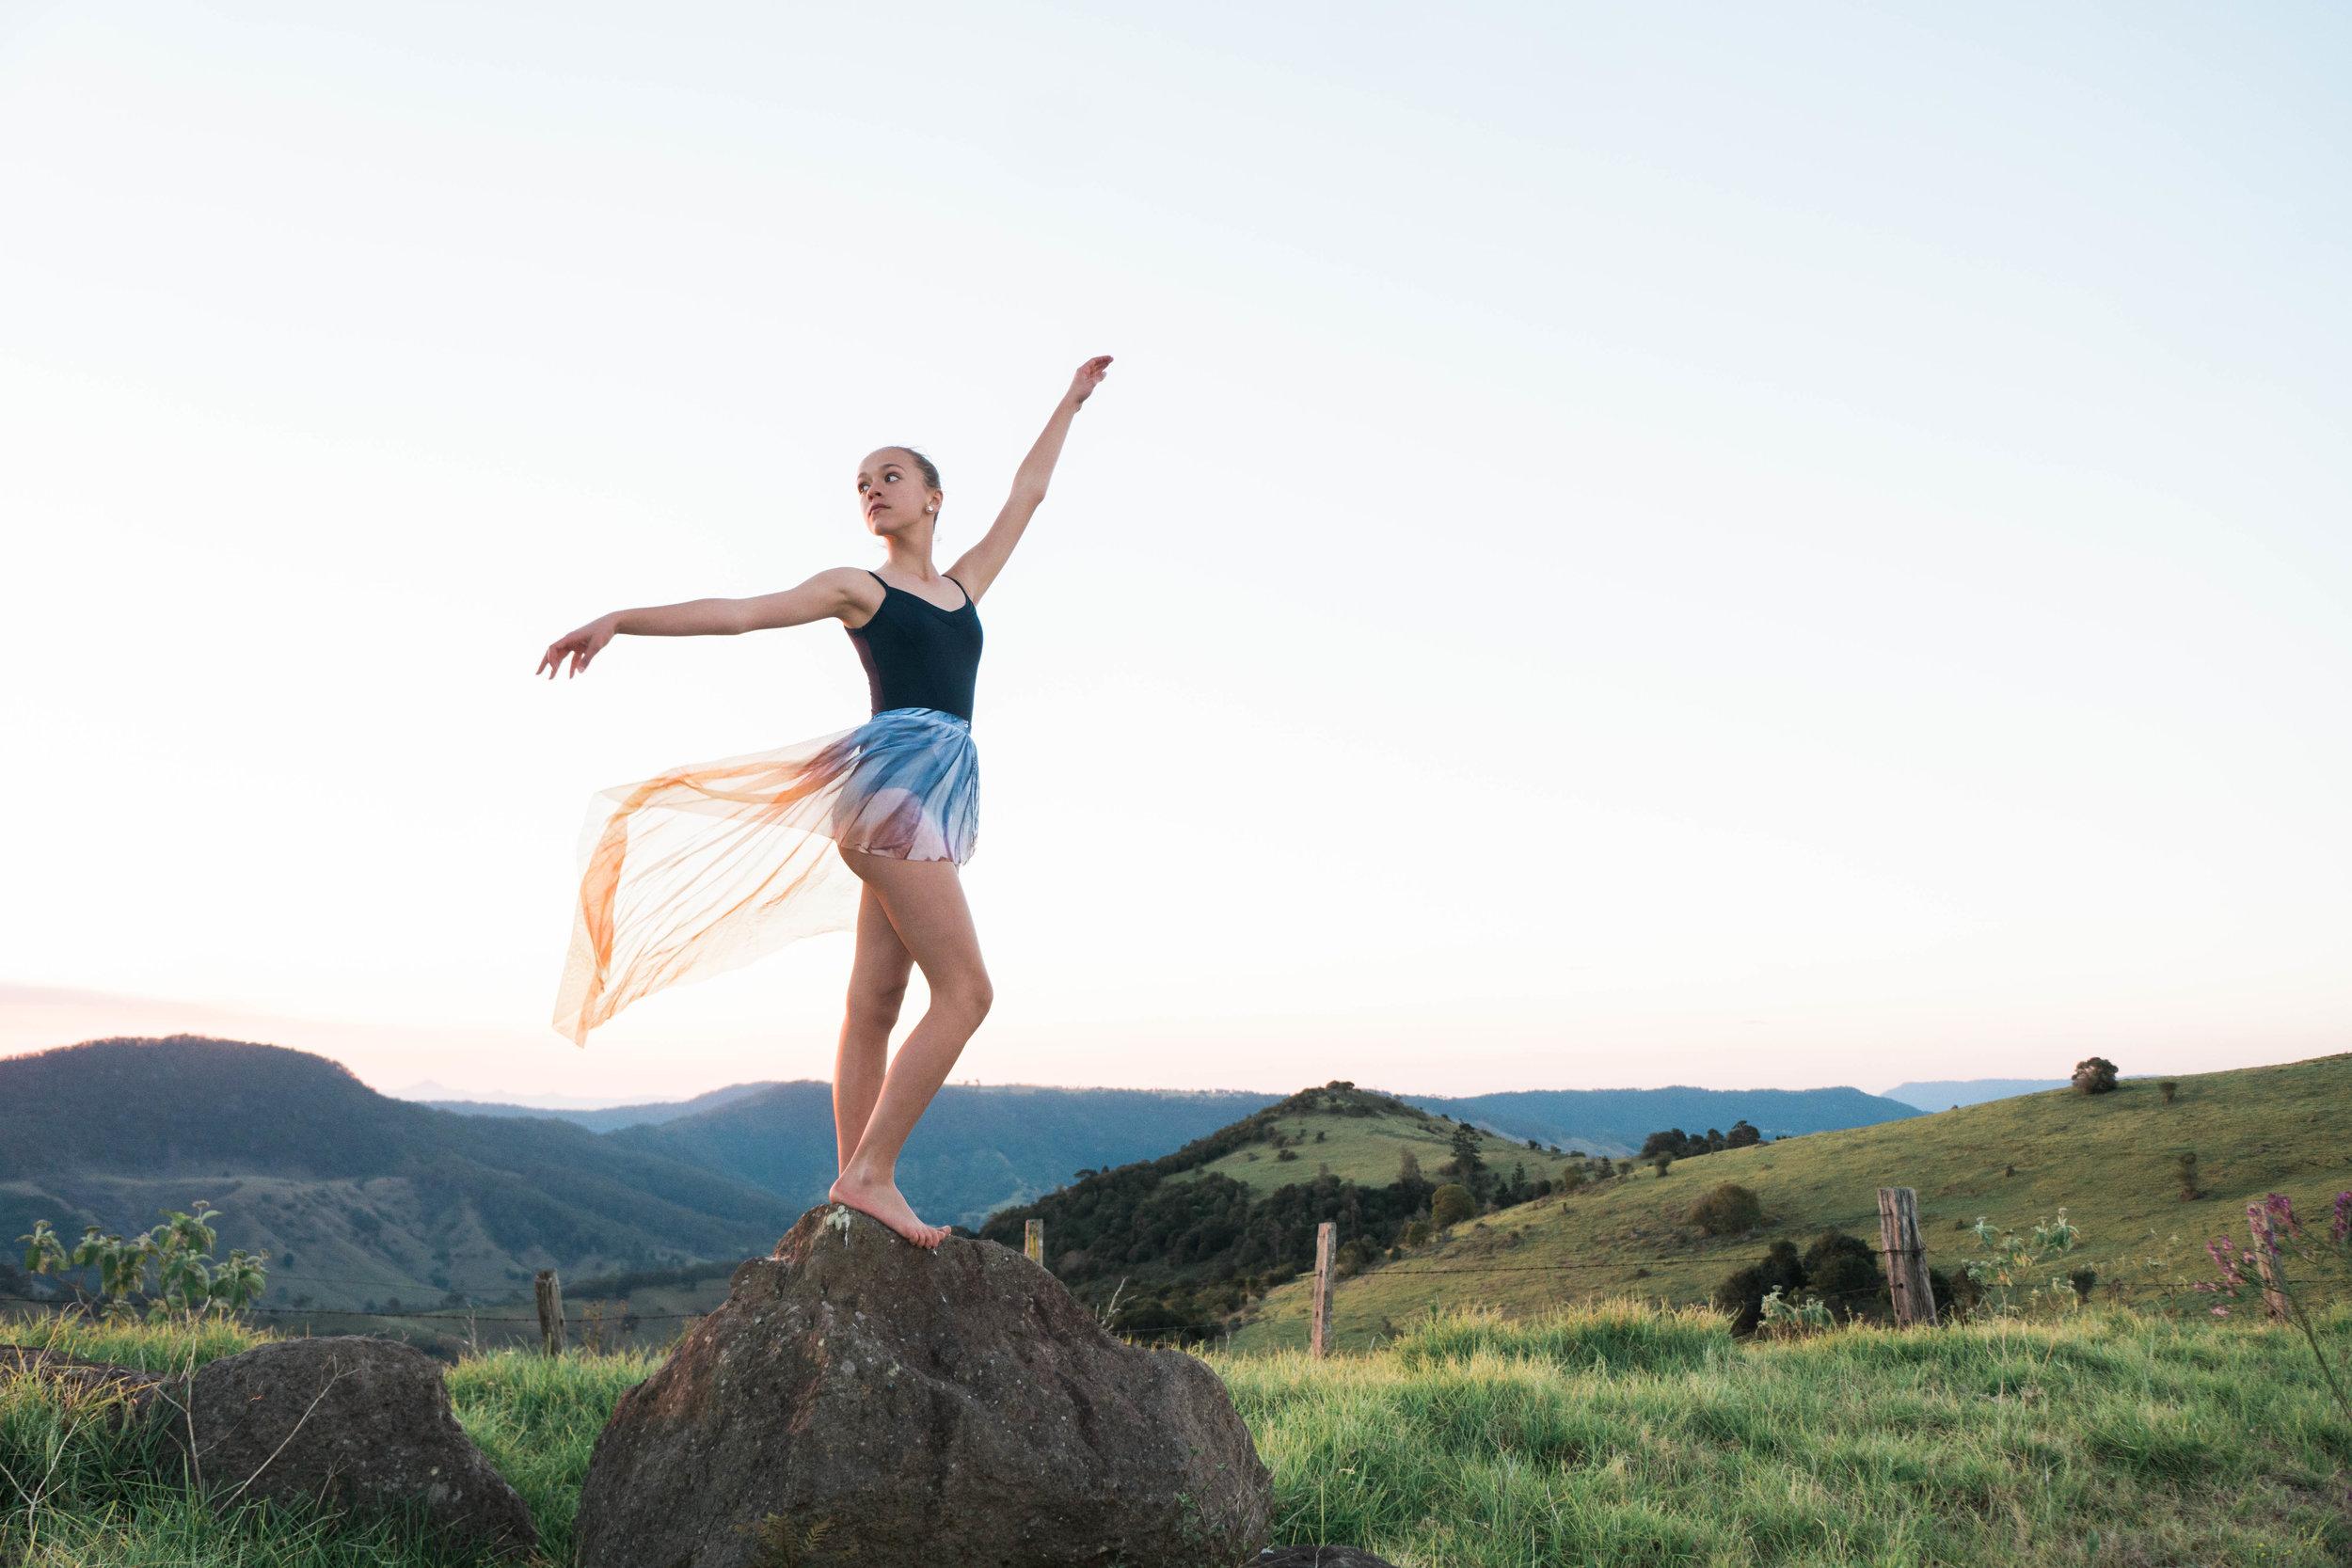 Hinterland-Dance-20.08.17-52.jpg